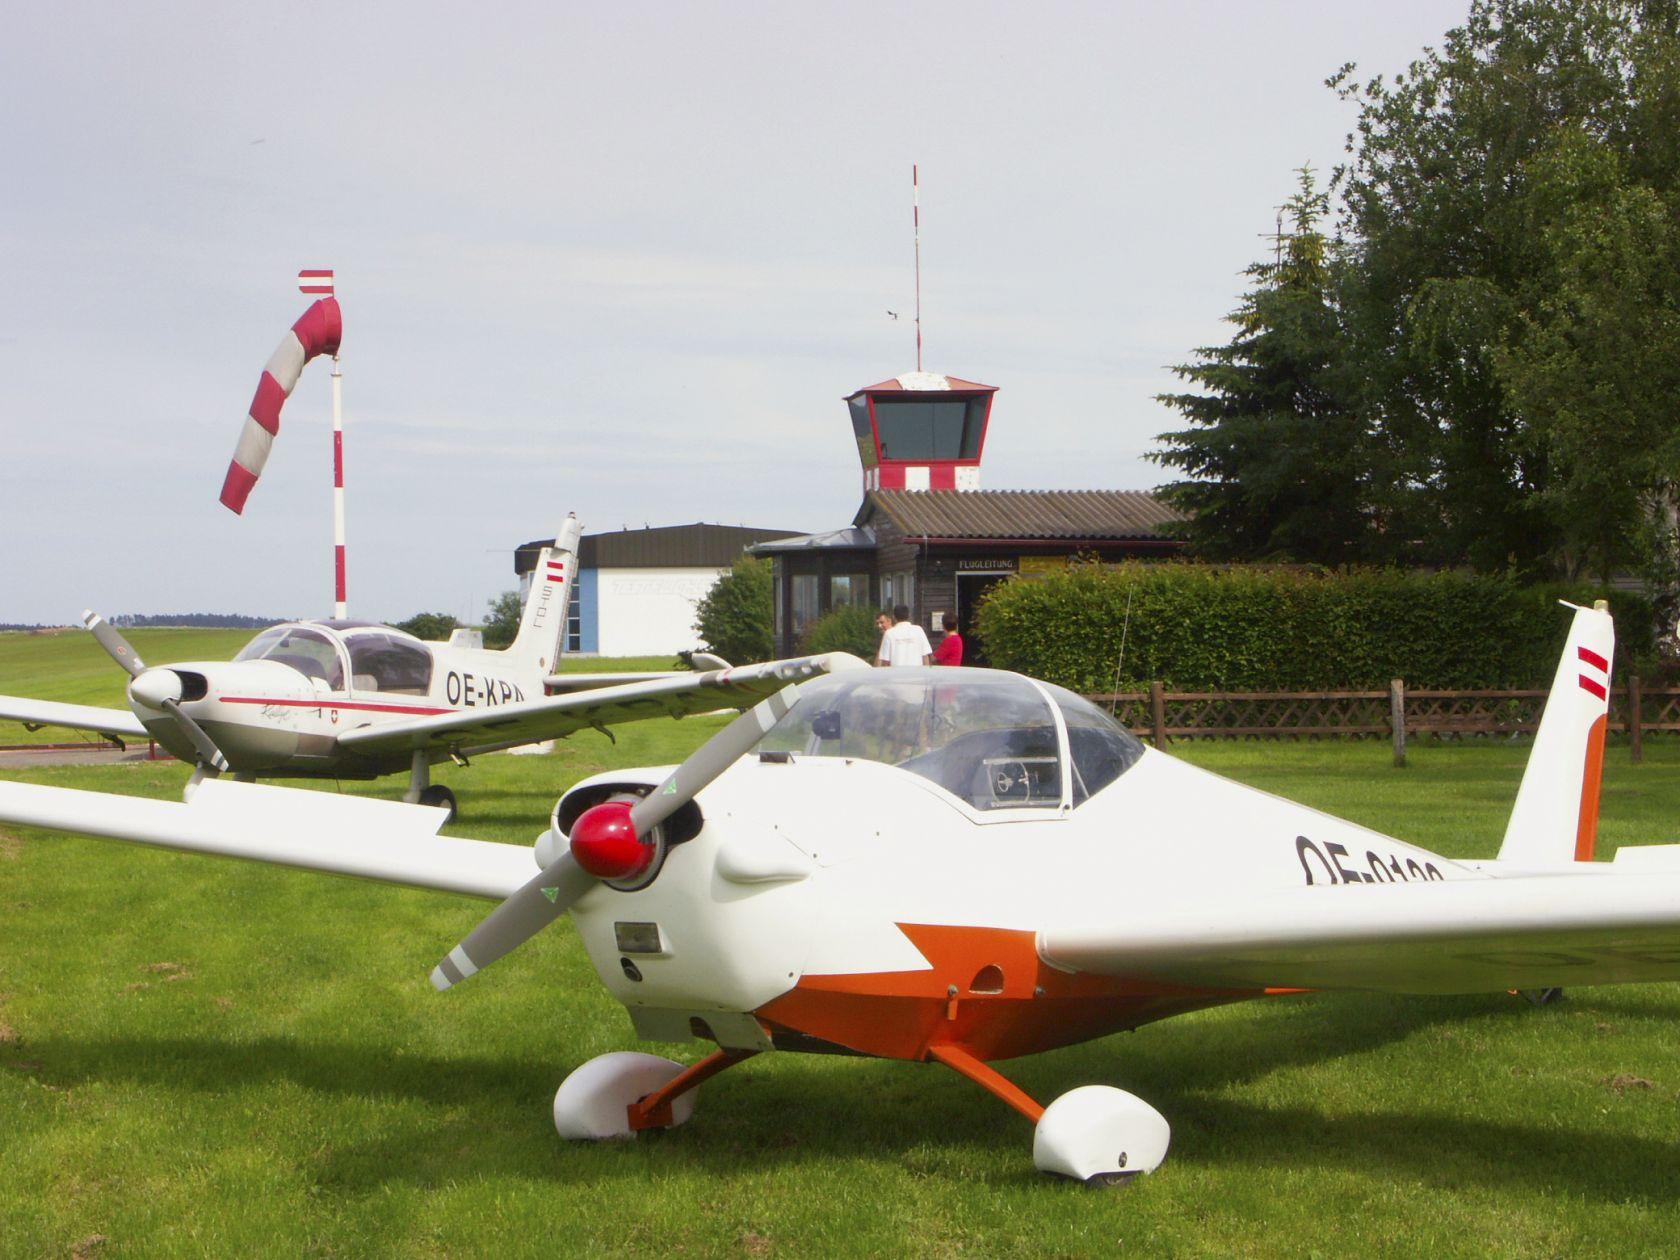 Thayarunde-Segelflug- und Motorflugschule